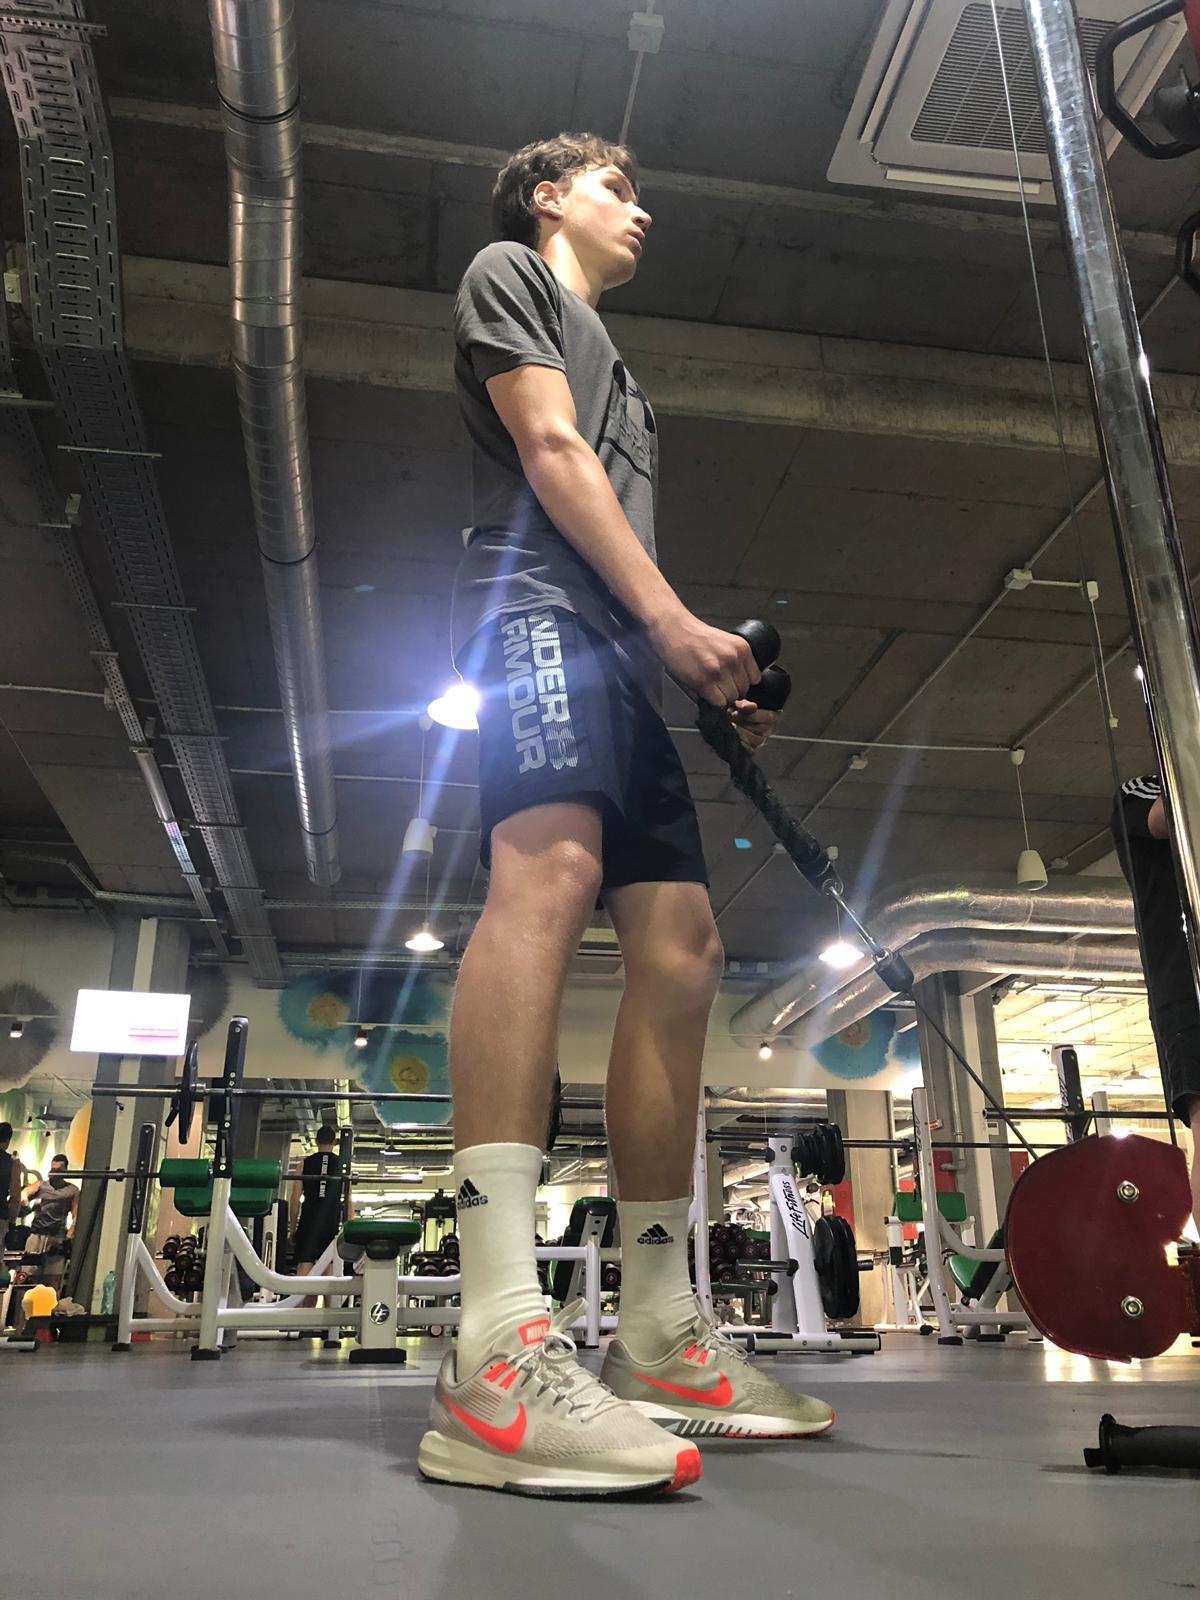 4 trucuri simple prin care un sportiv isi recapata increderea in sine si motivatia